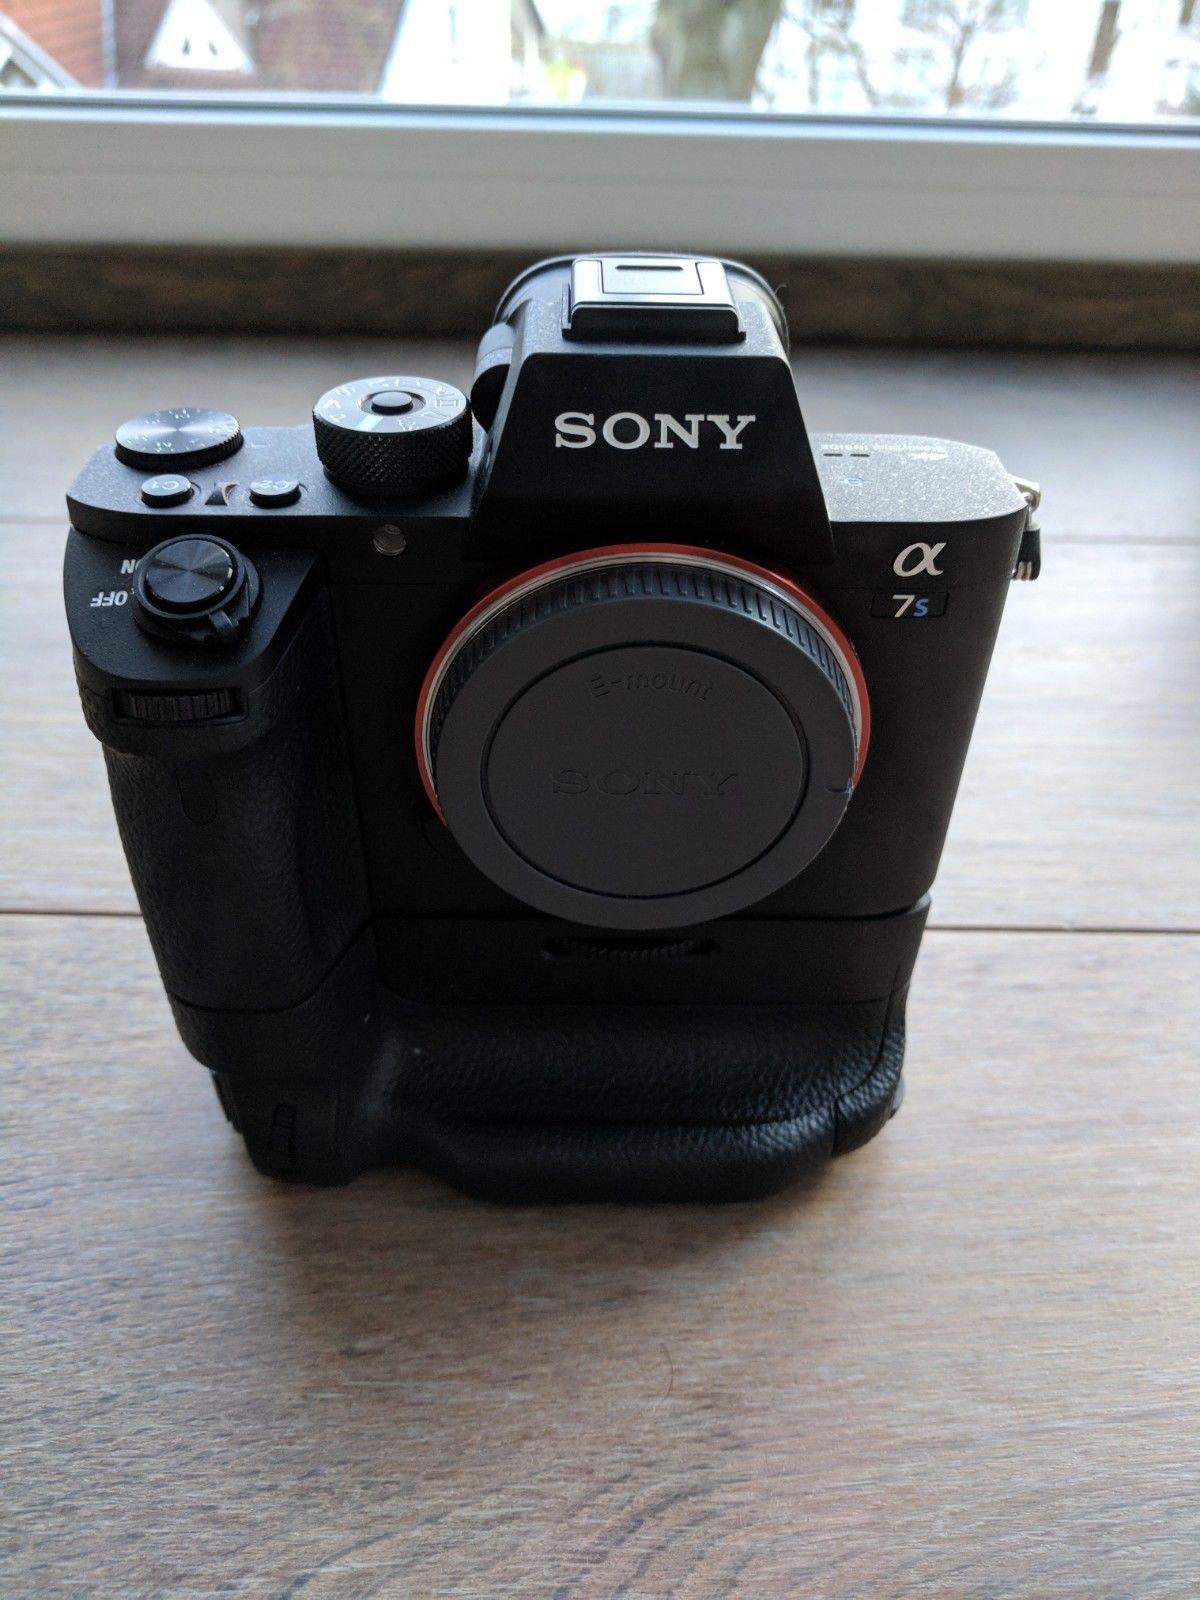 Sony Alpha a7s II Mirrorless Digital Kamera Body 7SM2 Mark 2 - 1031 AUSLÖSUNGEN